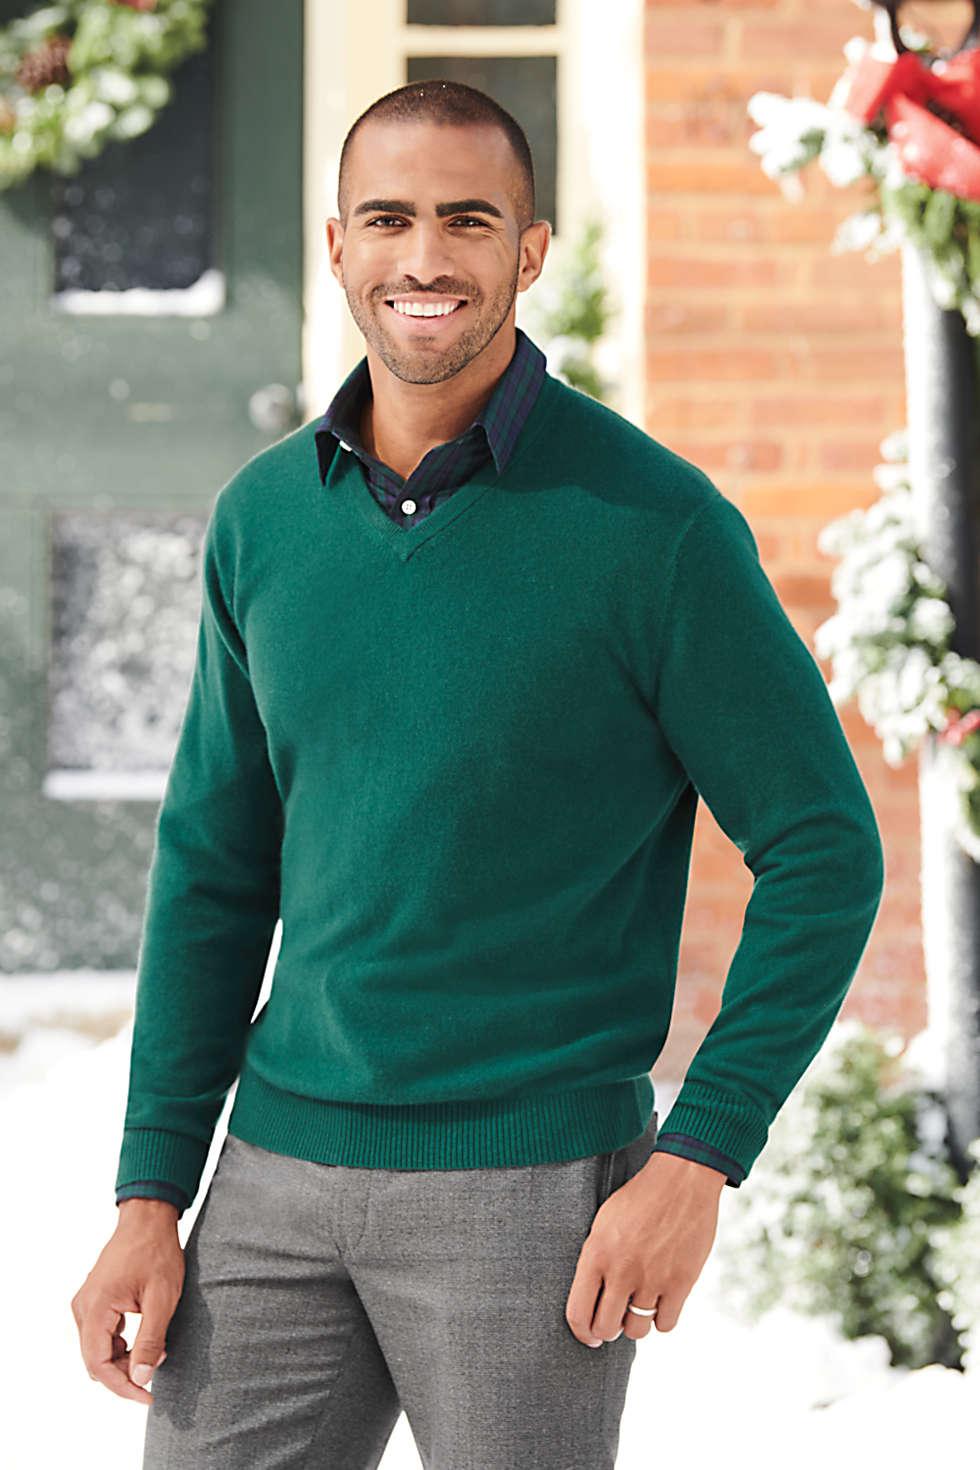 Lands End cashmere sweater, men's cashmere, cashmere sweaters